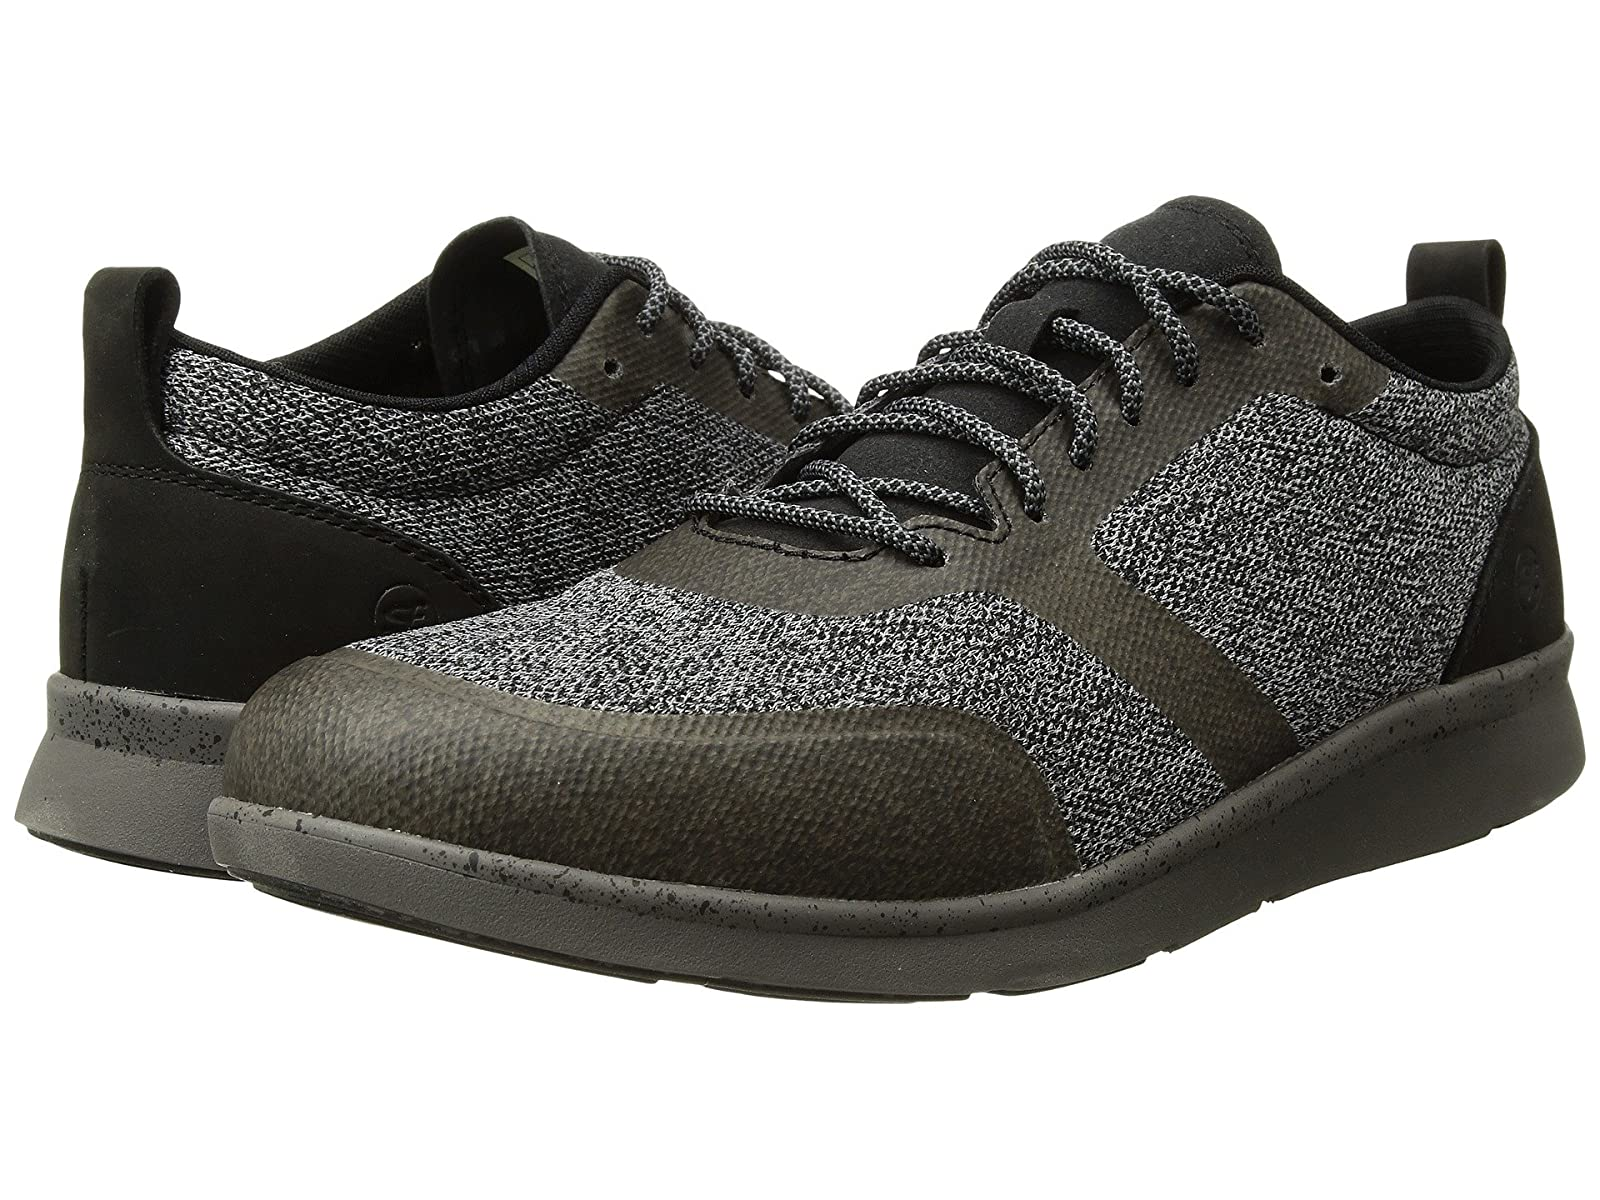 Superfeet Stuart MXAtmospheric grades have affordable shoes